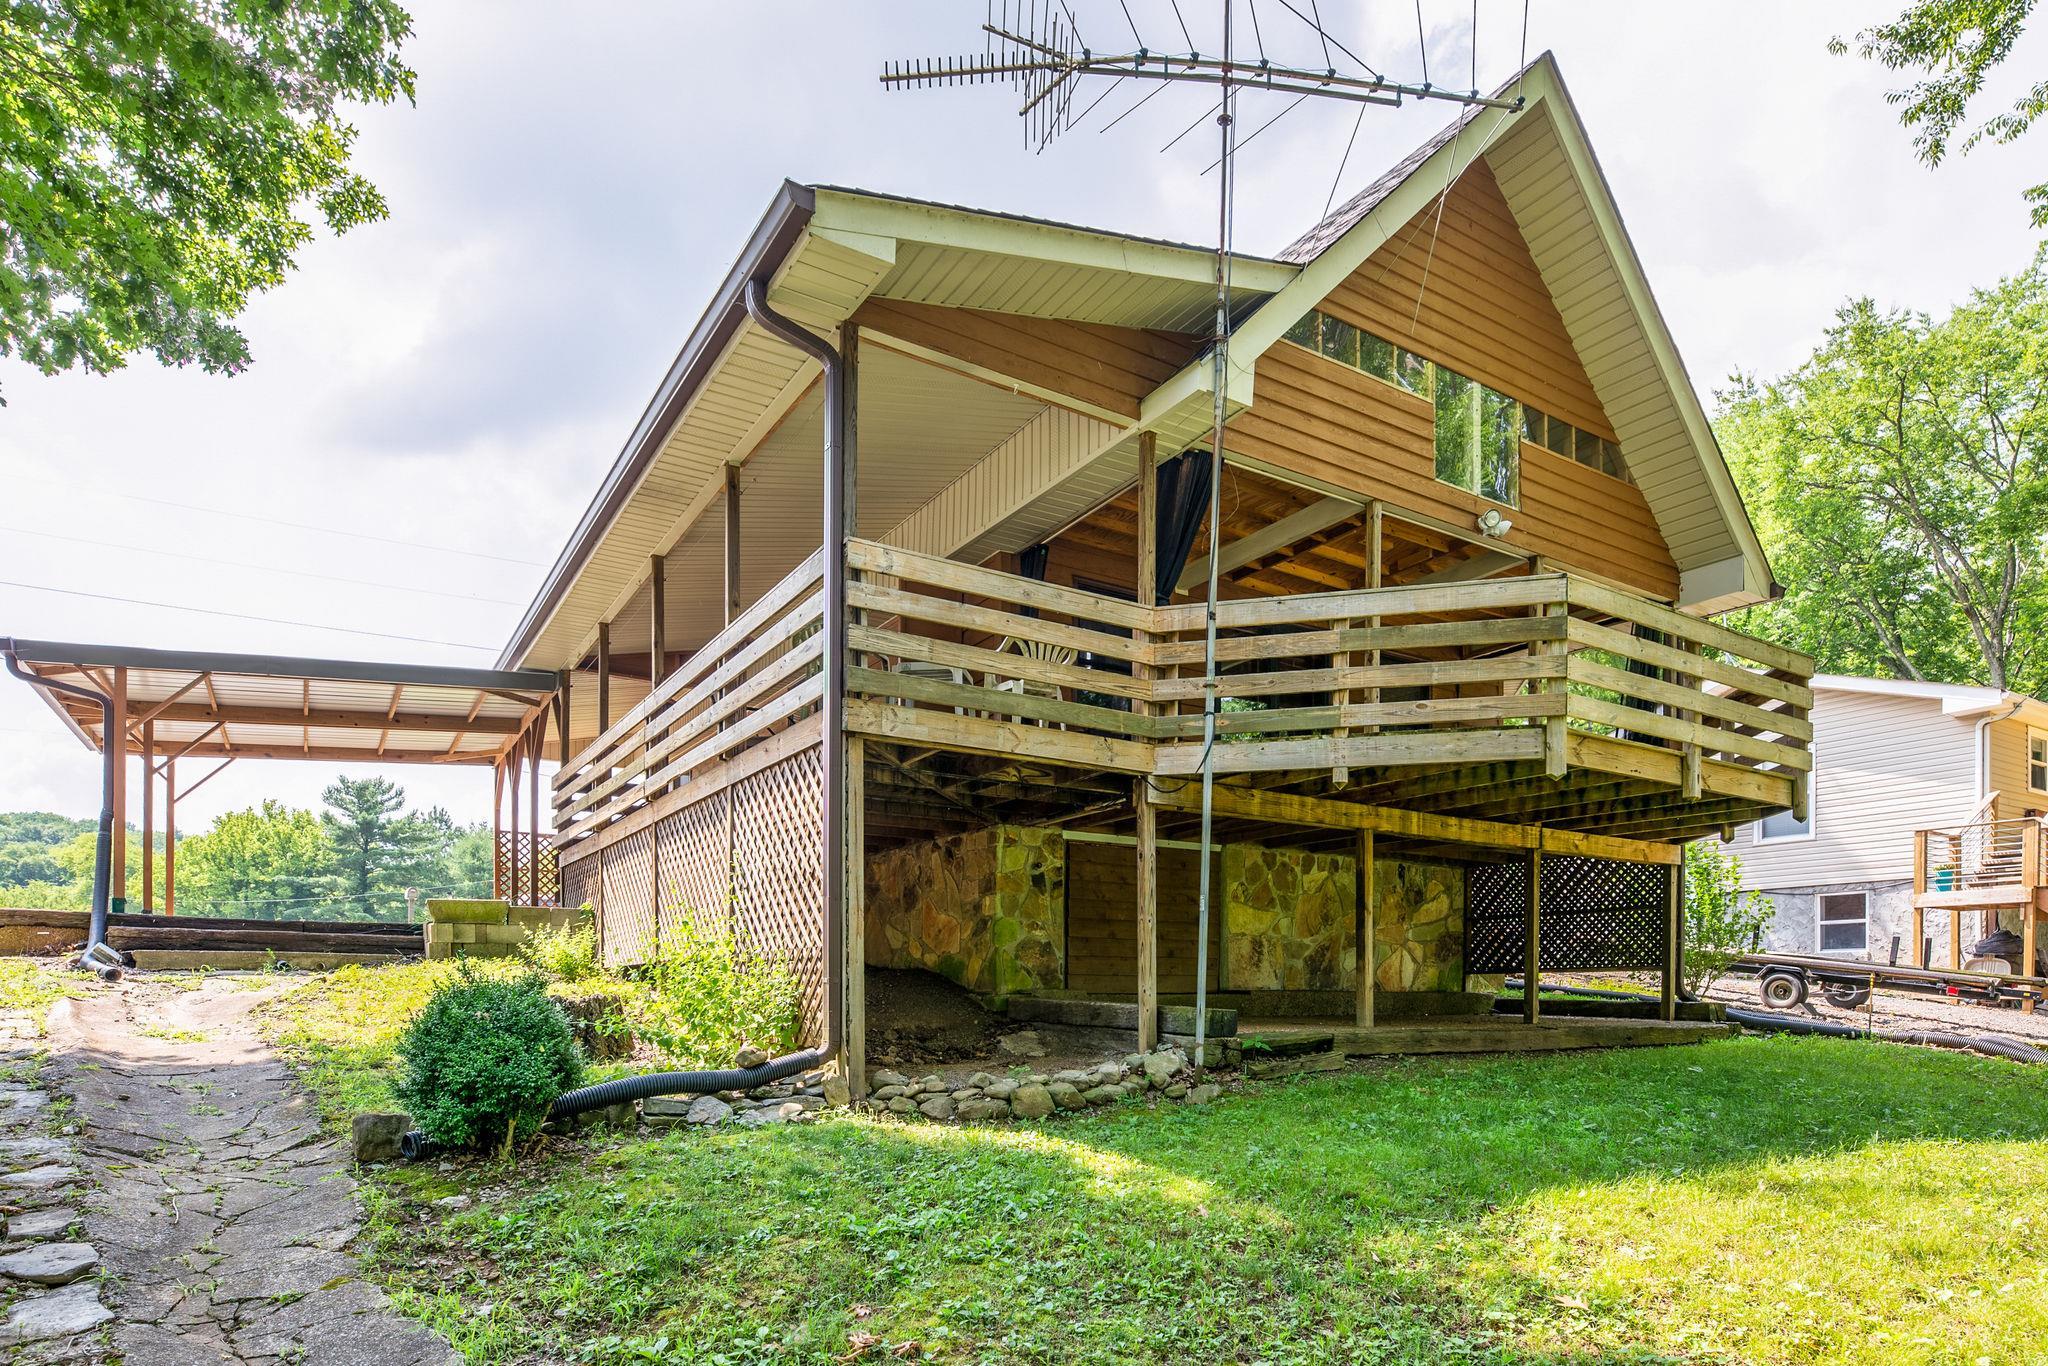 210 Breeze Inn Rd, Castalian Springs, TN 37031 - Castalian Springs, TN real estate listing